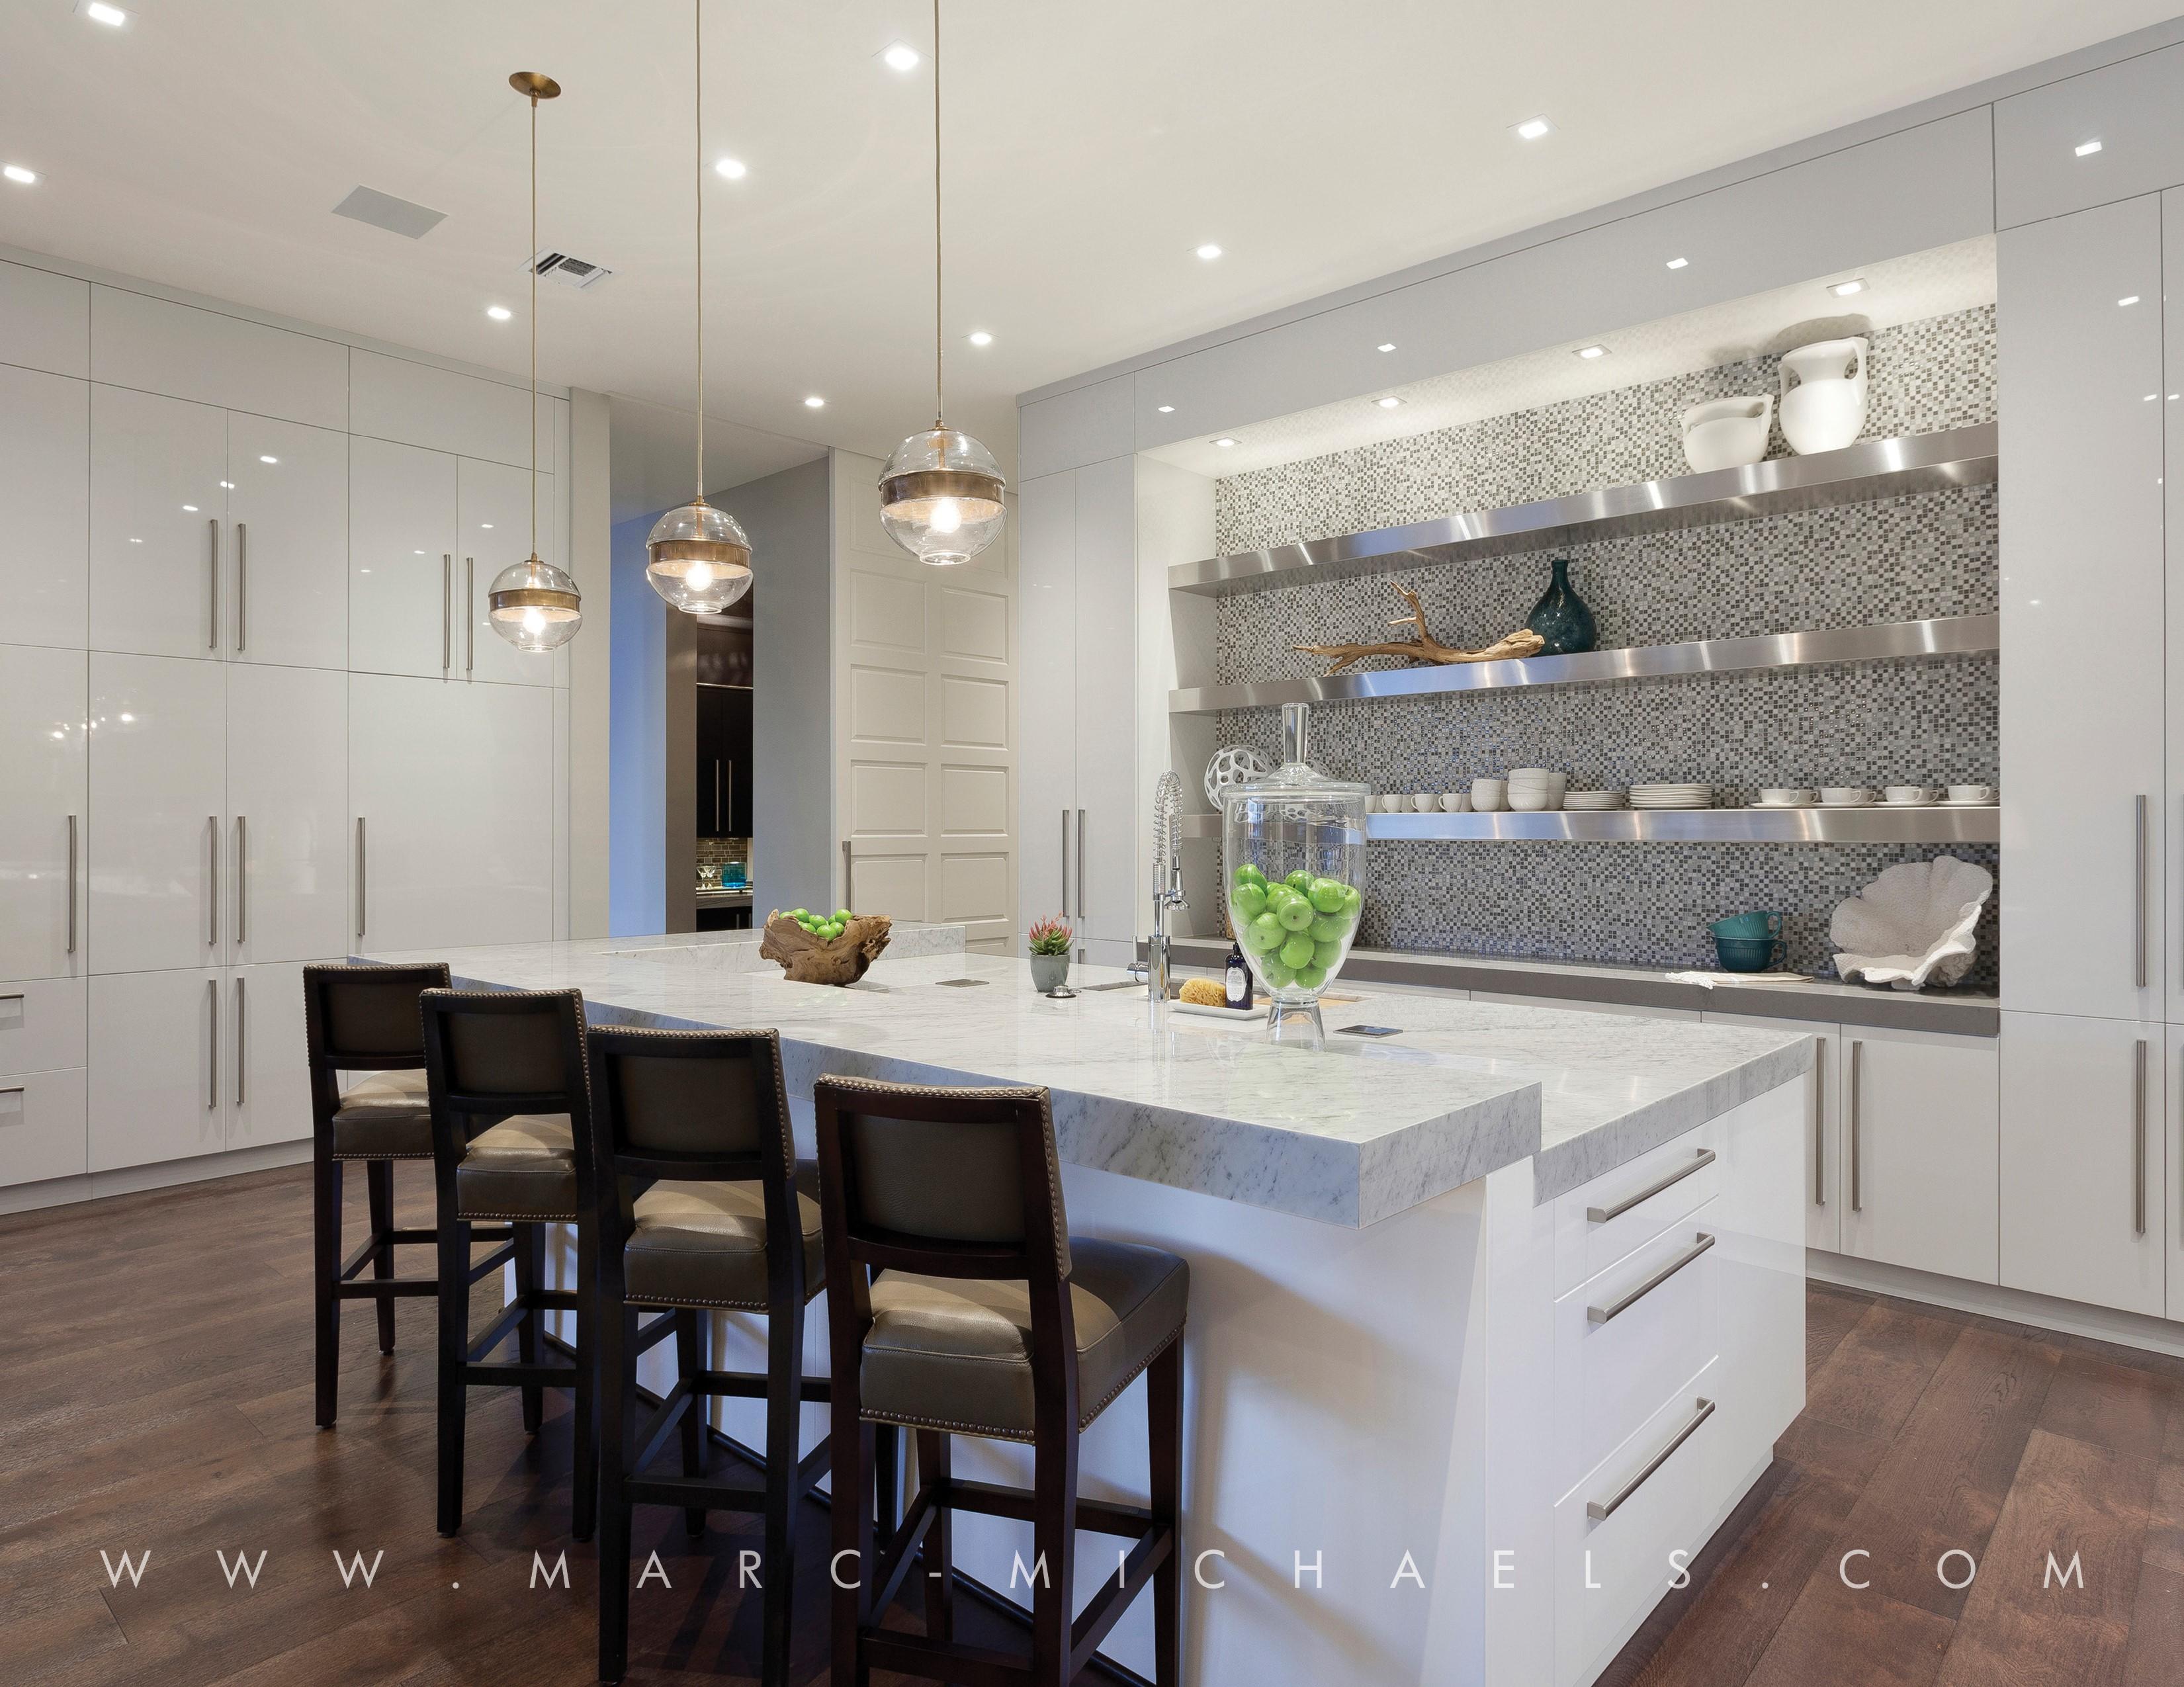 Brand new boca raton home designed by marc michaels - Interior design services boca raton ...